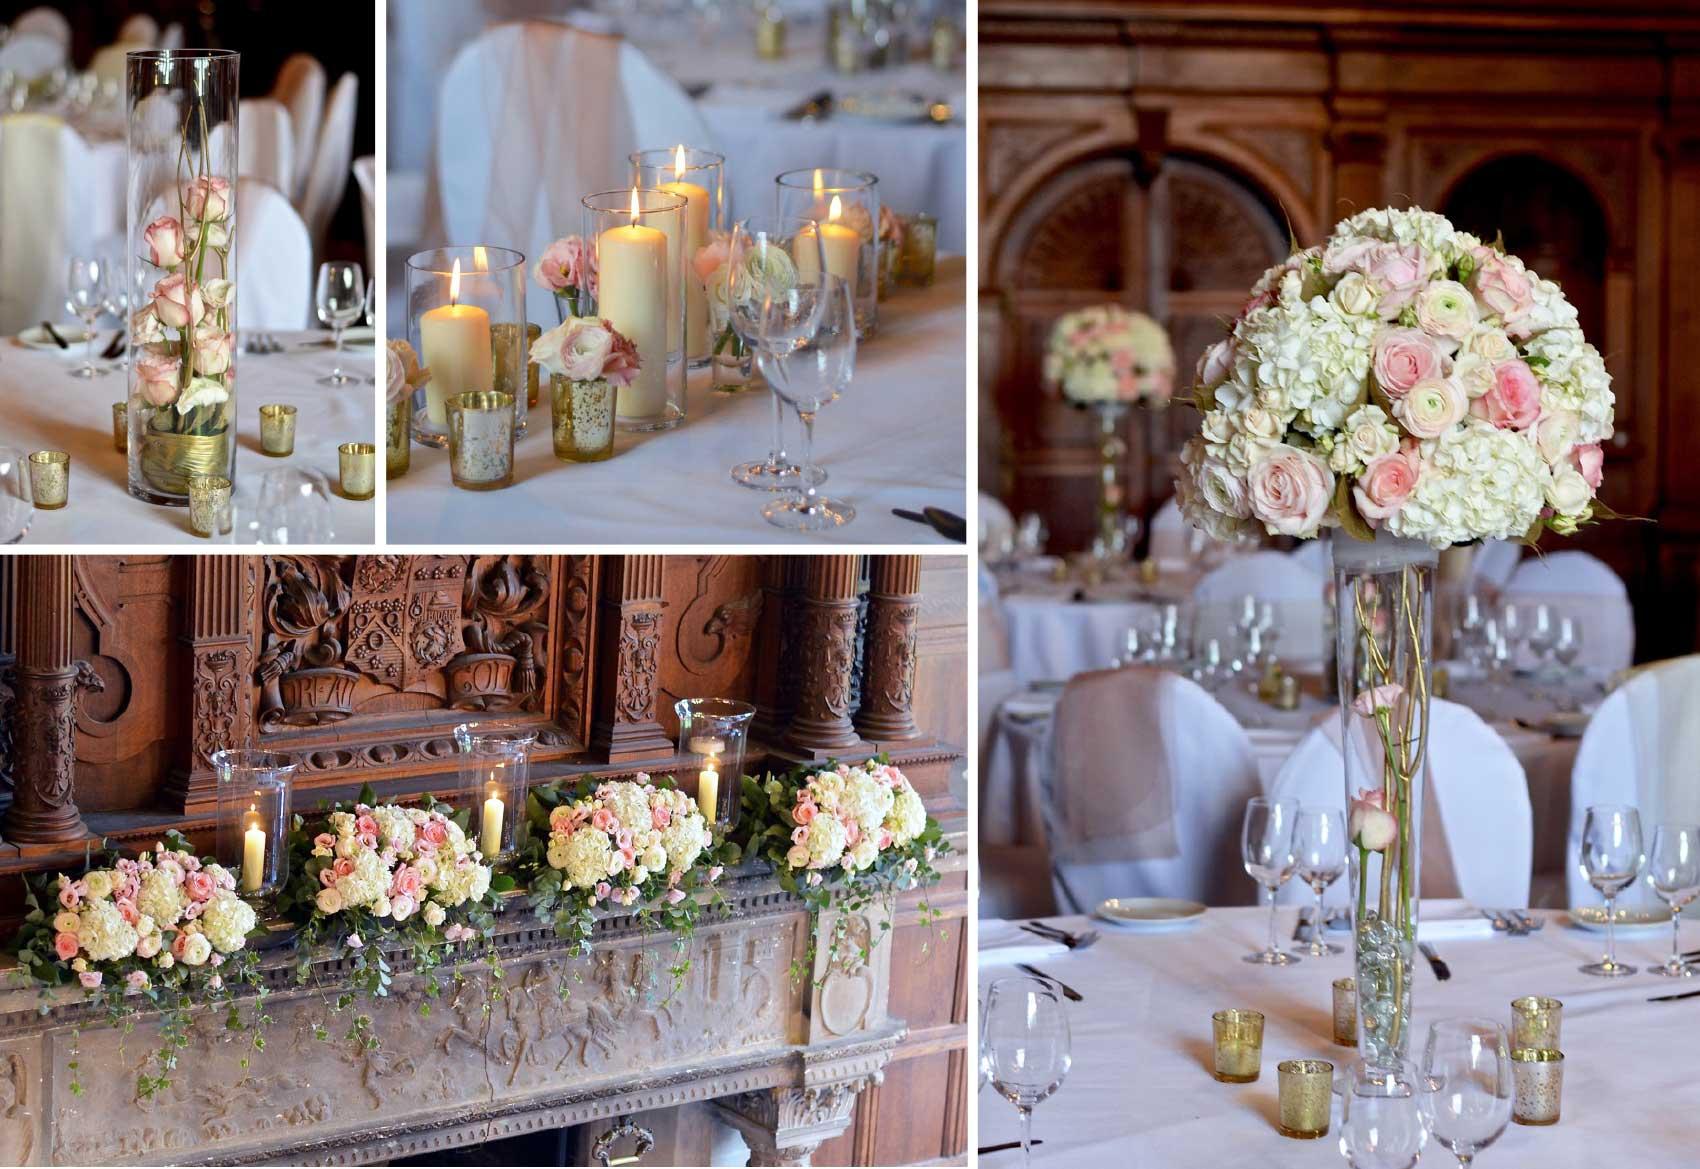 Fiori By Lynne Wedding Flowers Southampton Venue Flowers